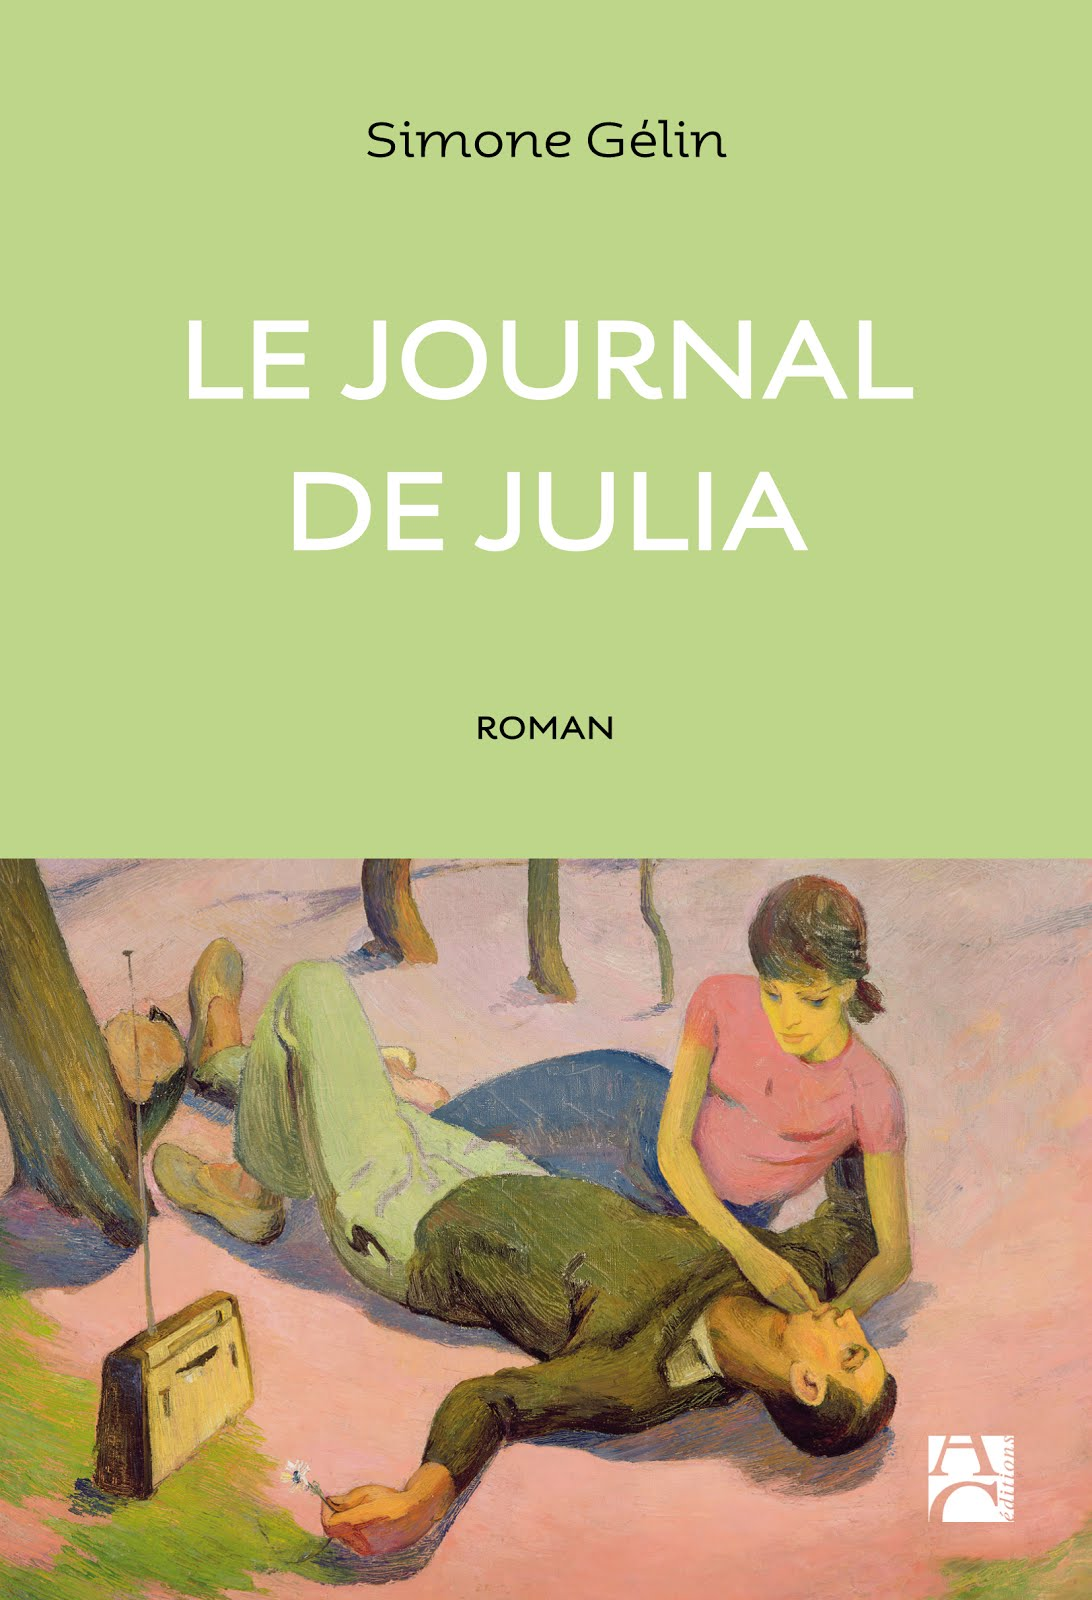 Un roman sur la justice